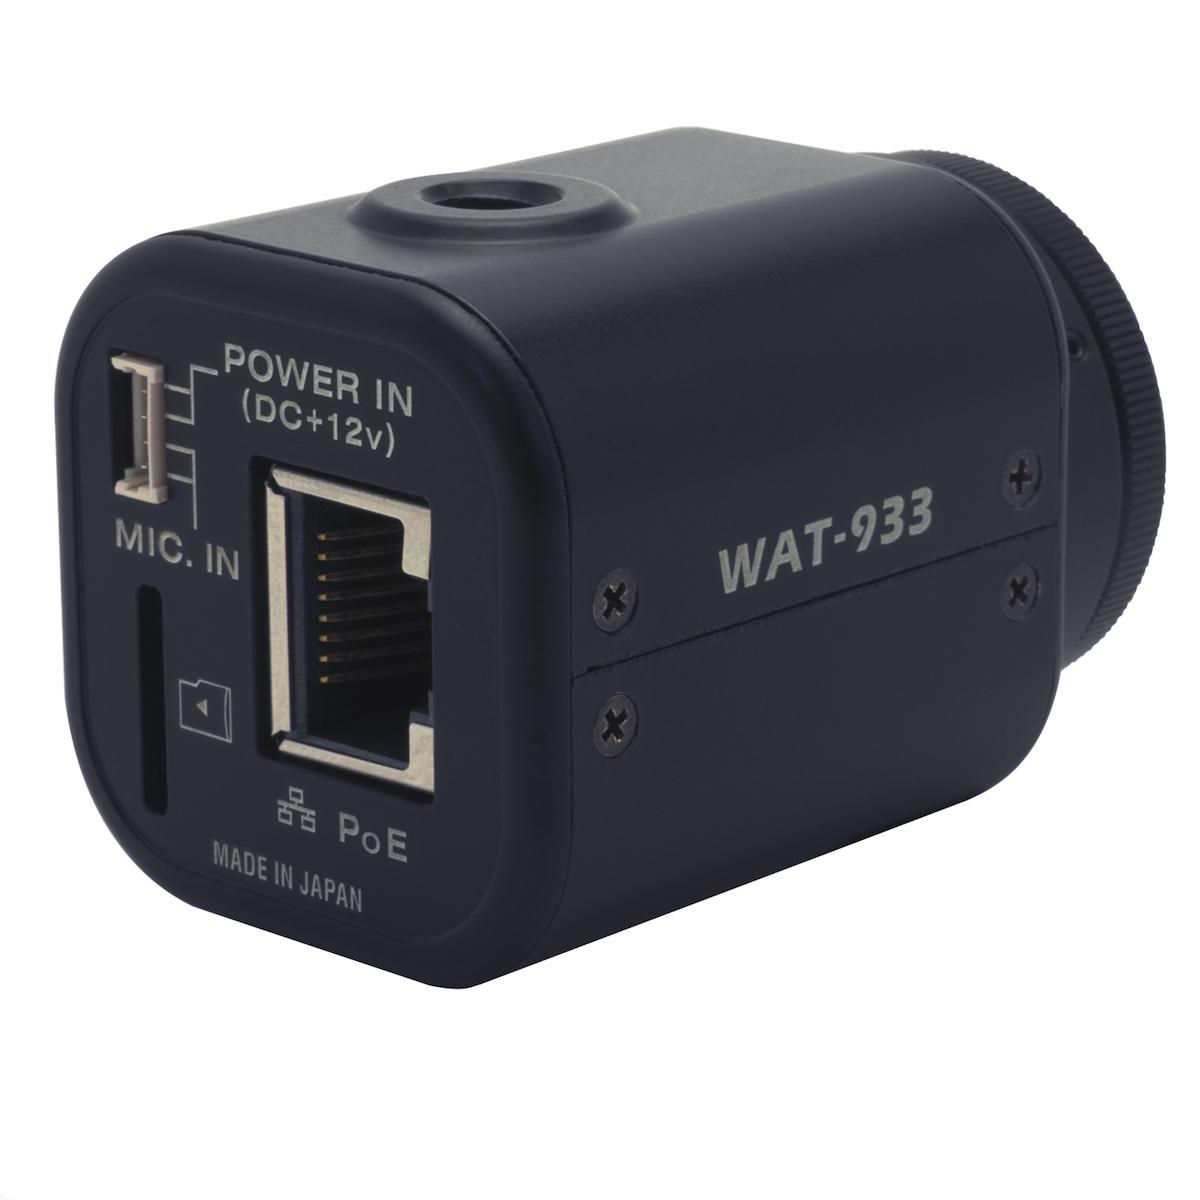 Watec WAT-933 camera rear view